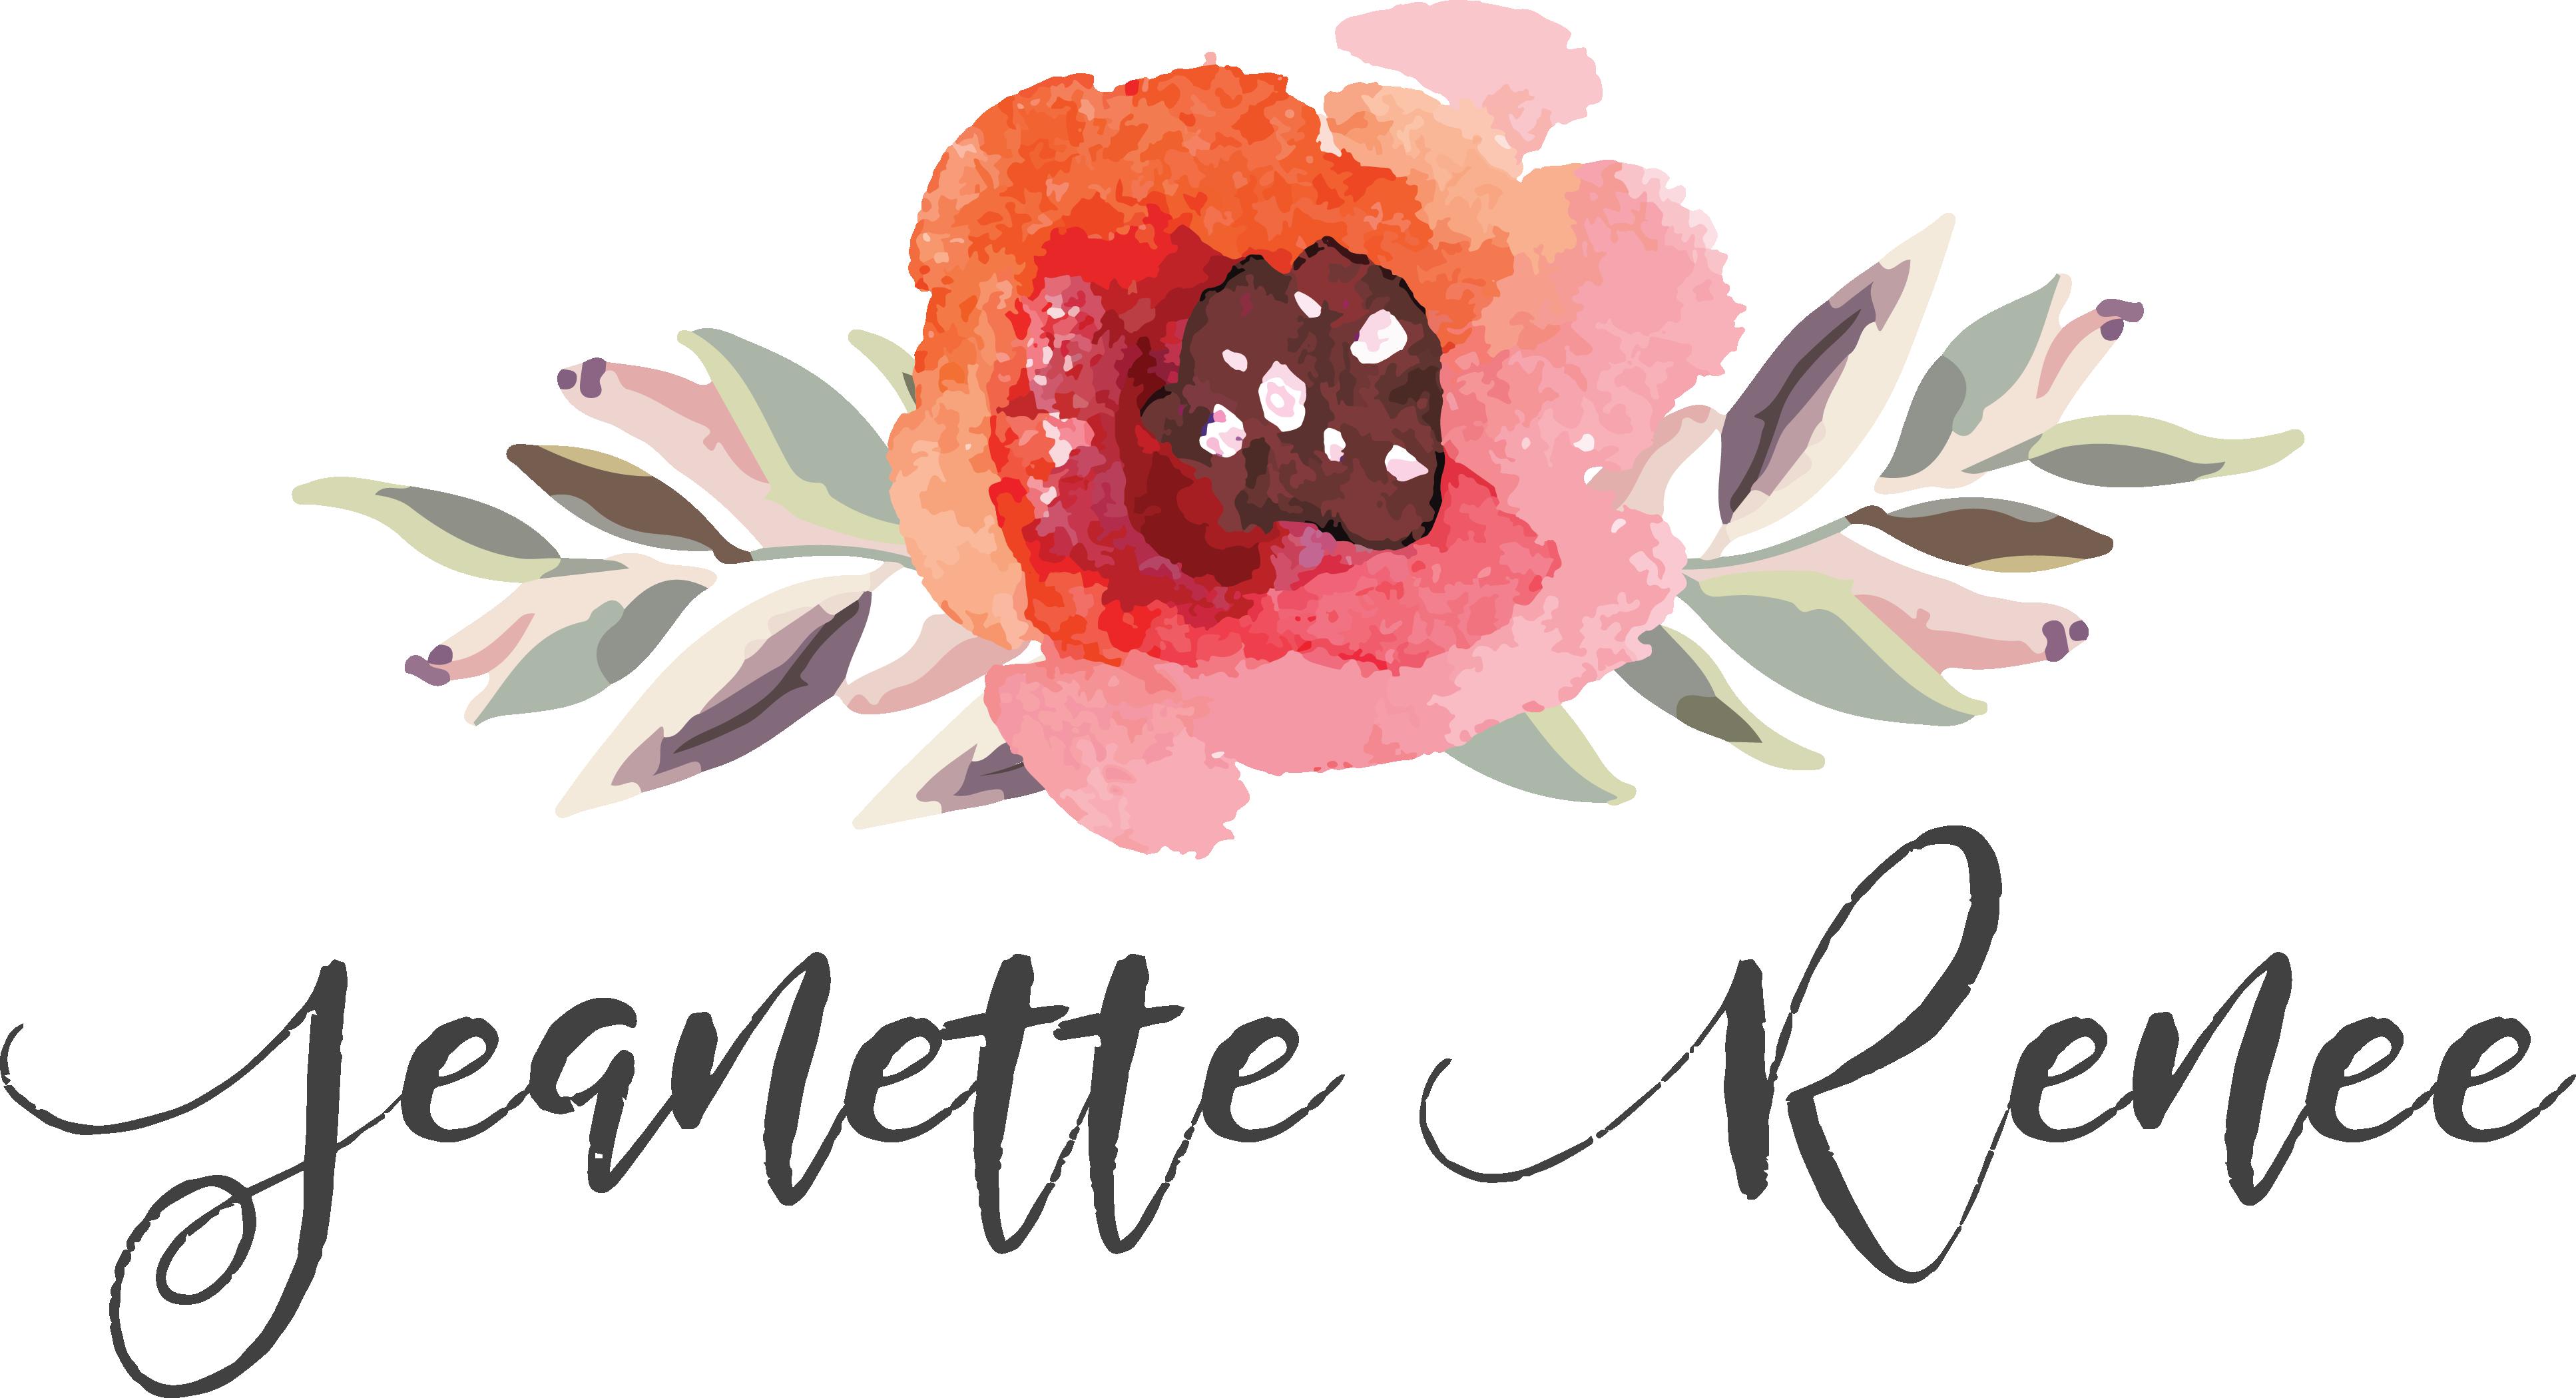 jeanette renee blog